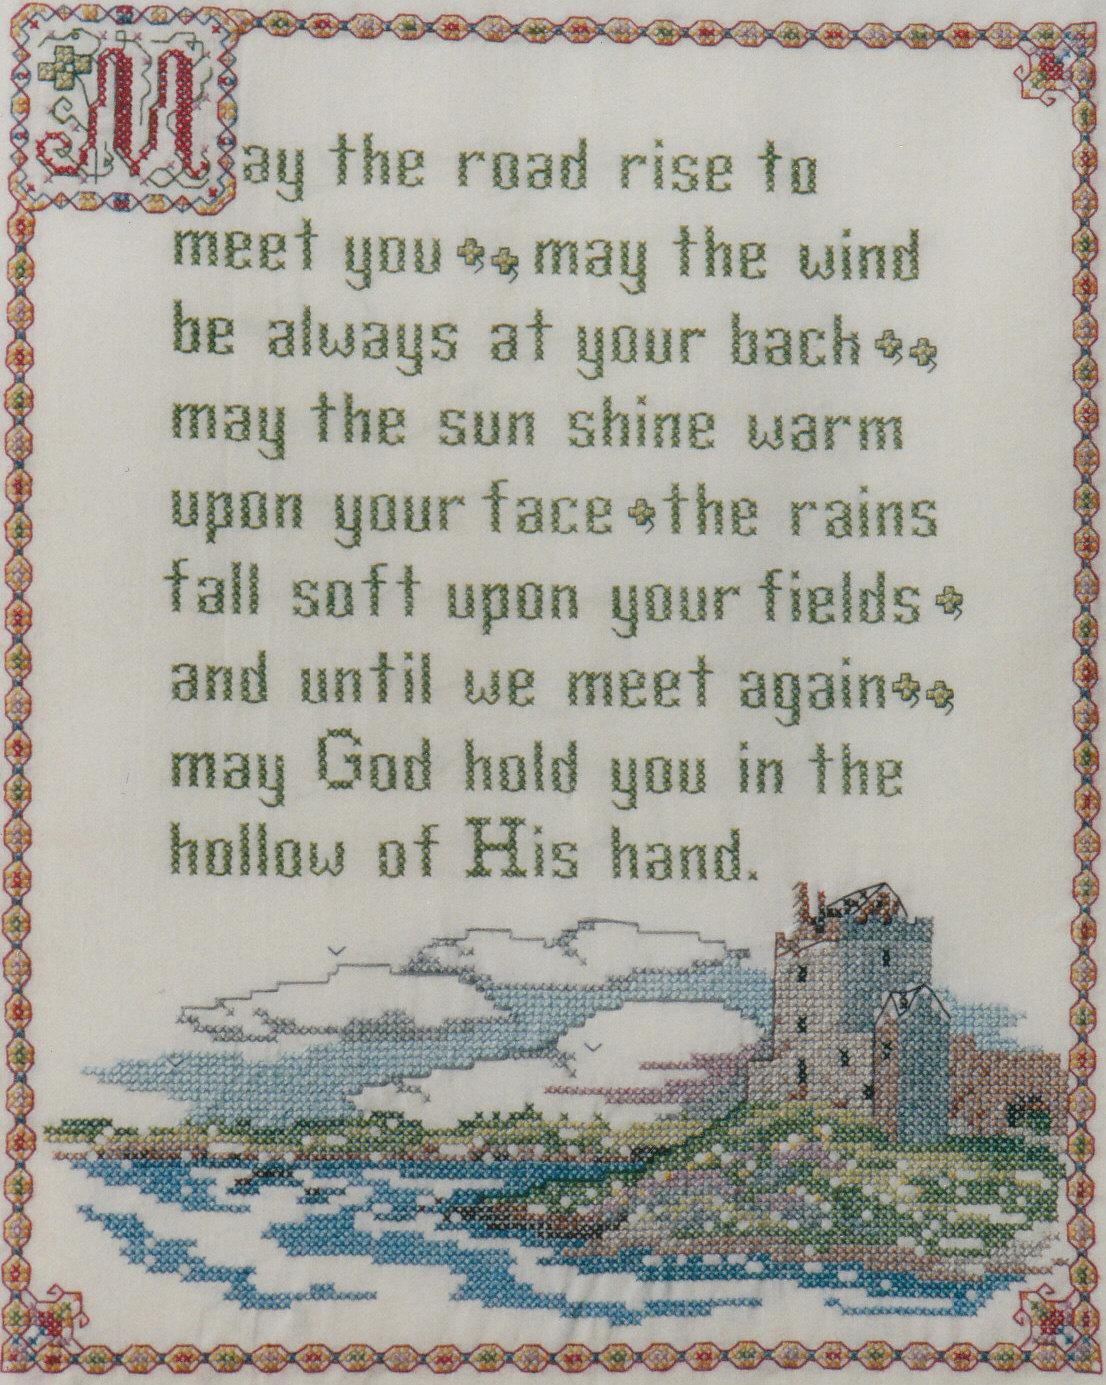 Irish blessing melitastitches4funs blog advertisements m4hsunfo